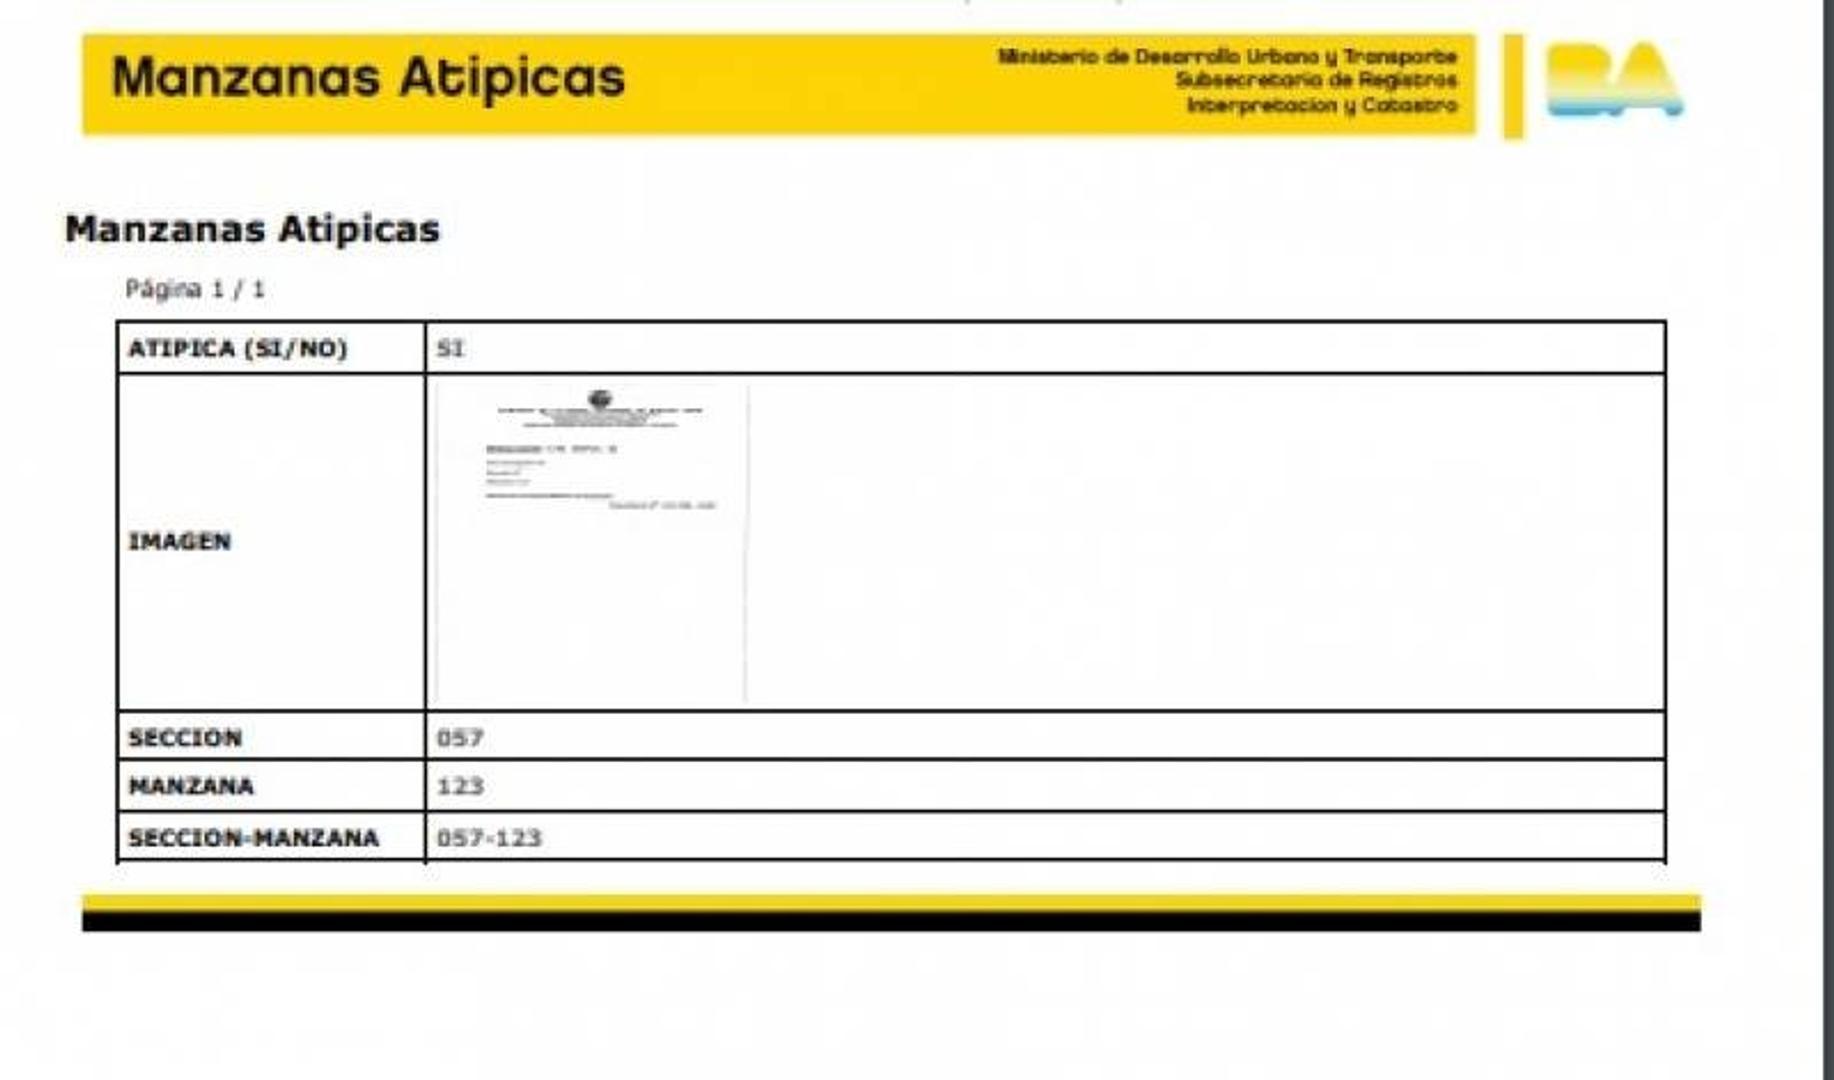 Terreno - 4.446 m²   10,05 m   U85 Zona 4  - C3II